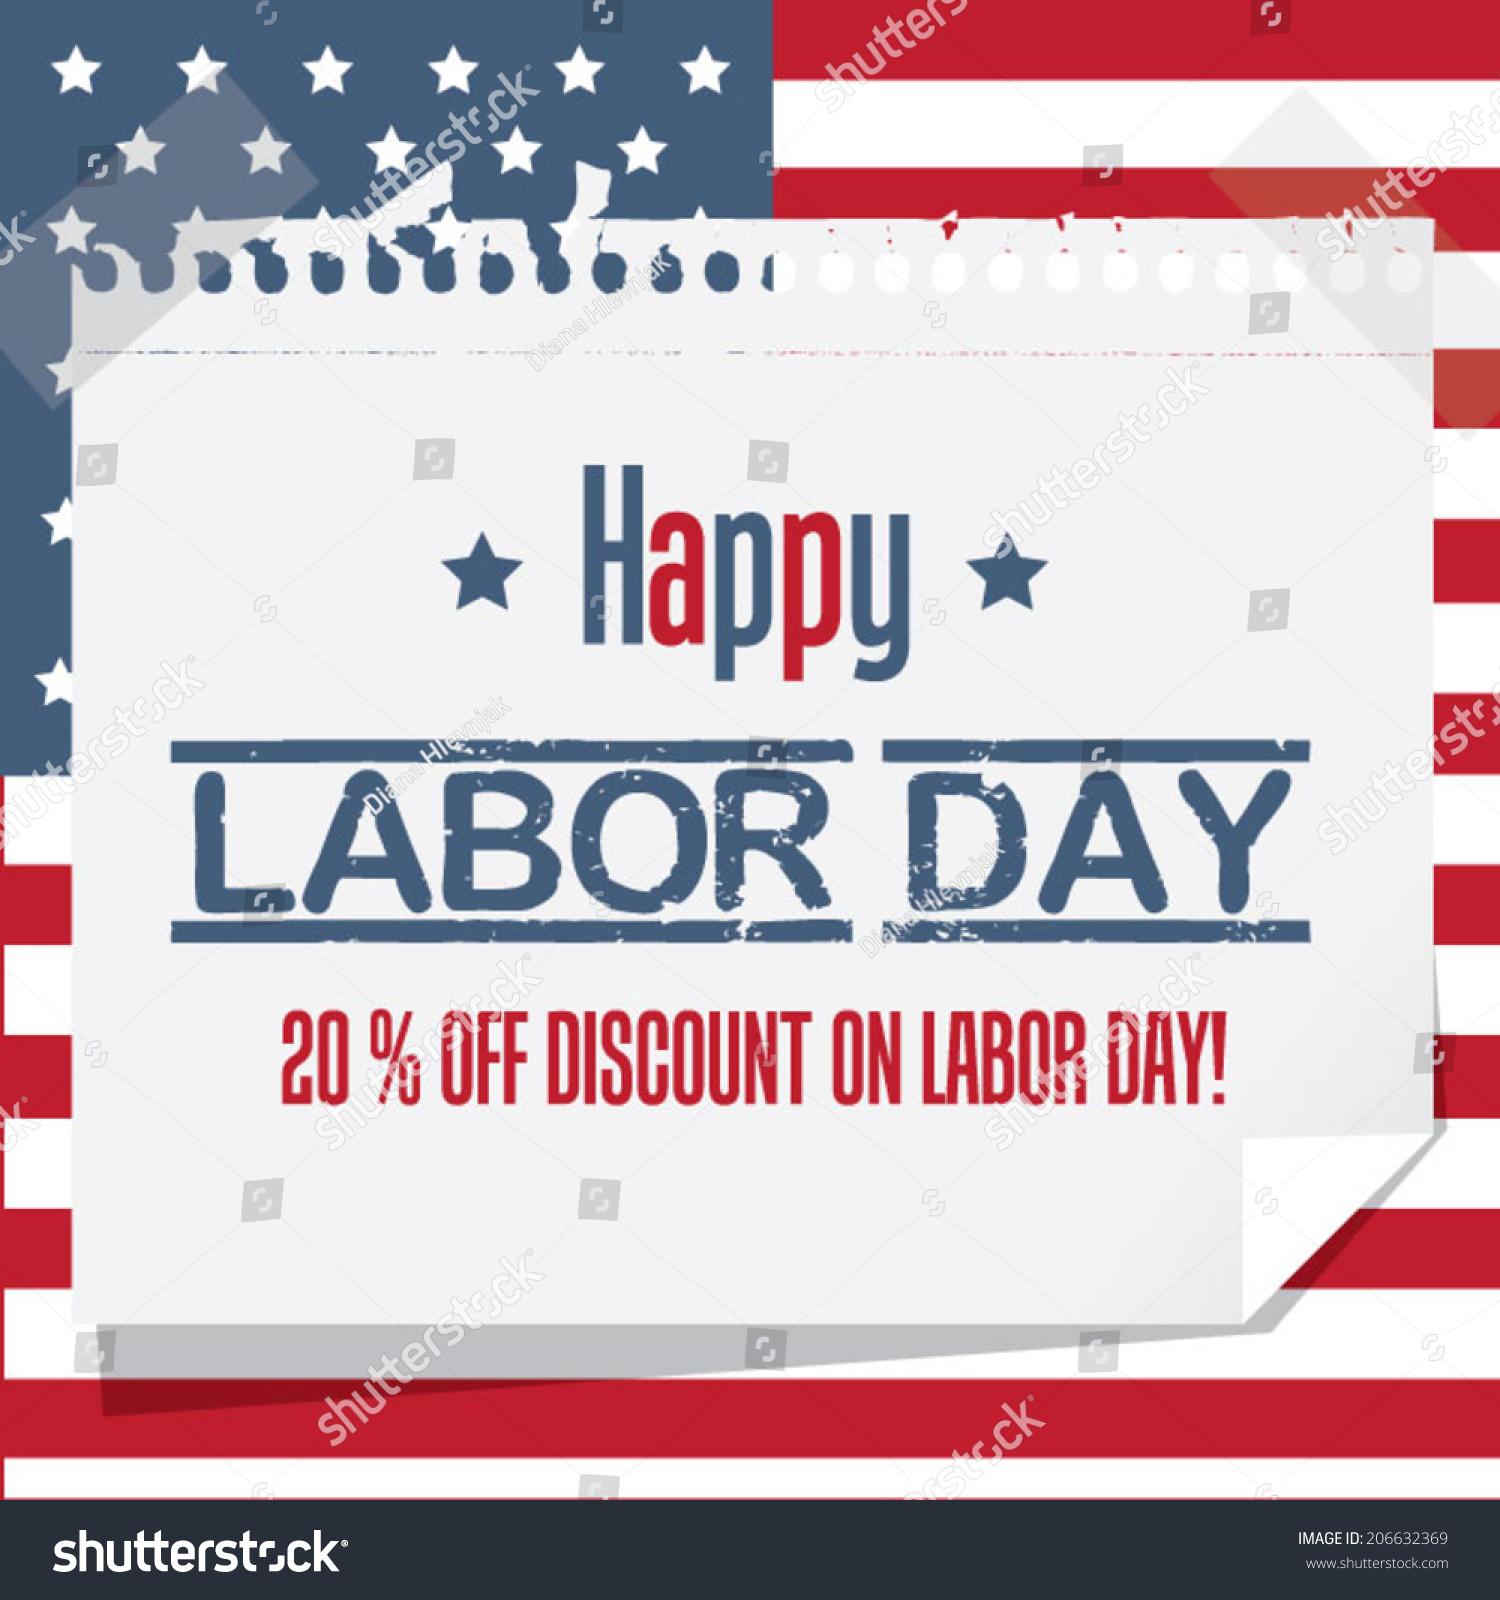 Happy Labor Day Discount Wallpaper Stock Vector 206632369